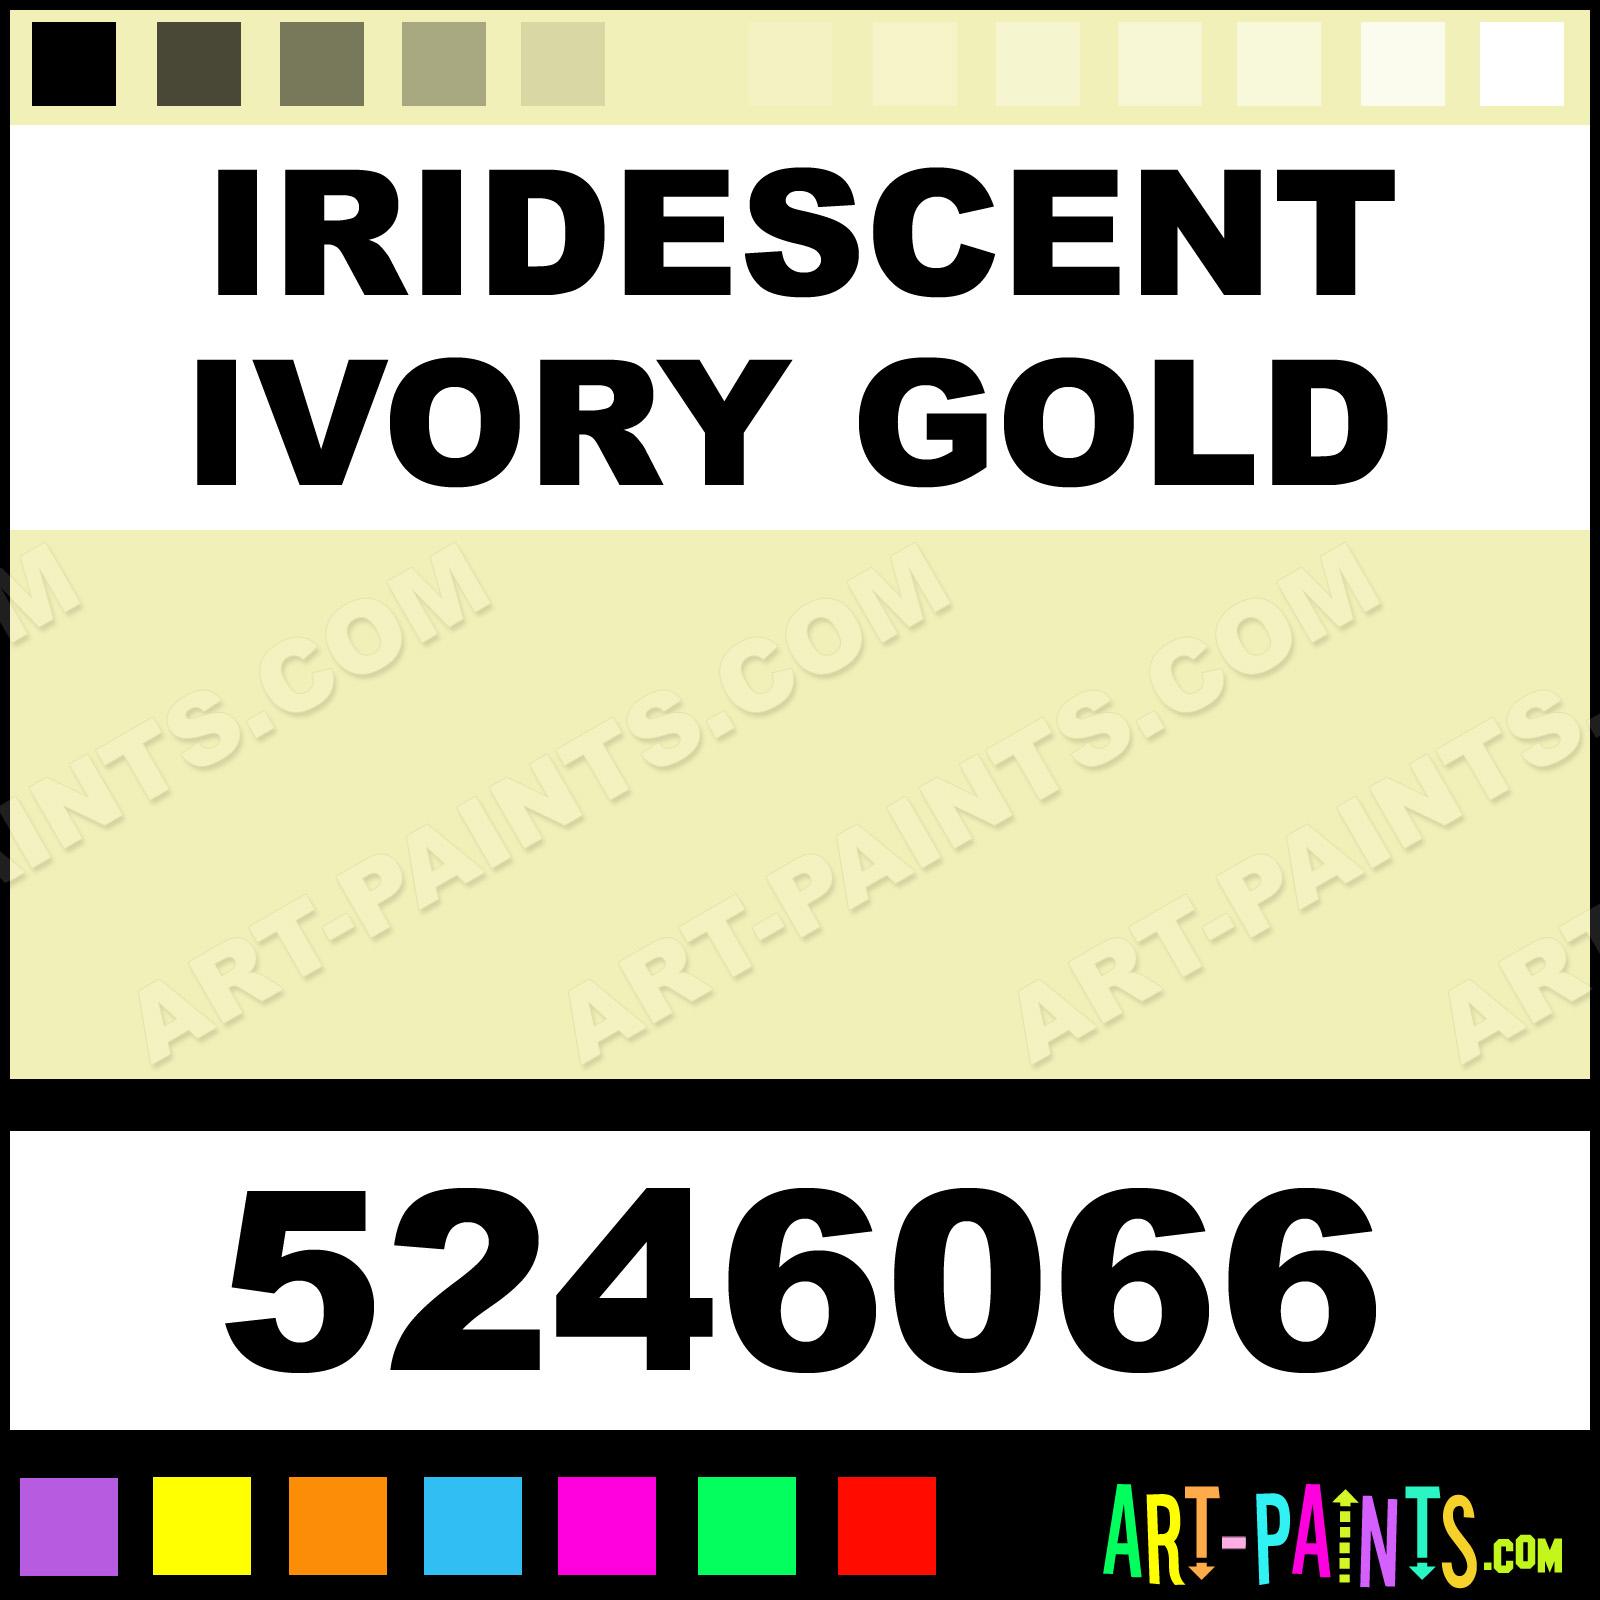 Iridescent Ivory Gold Dry PermEnamel Enamel Paints - 5246066